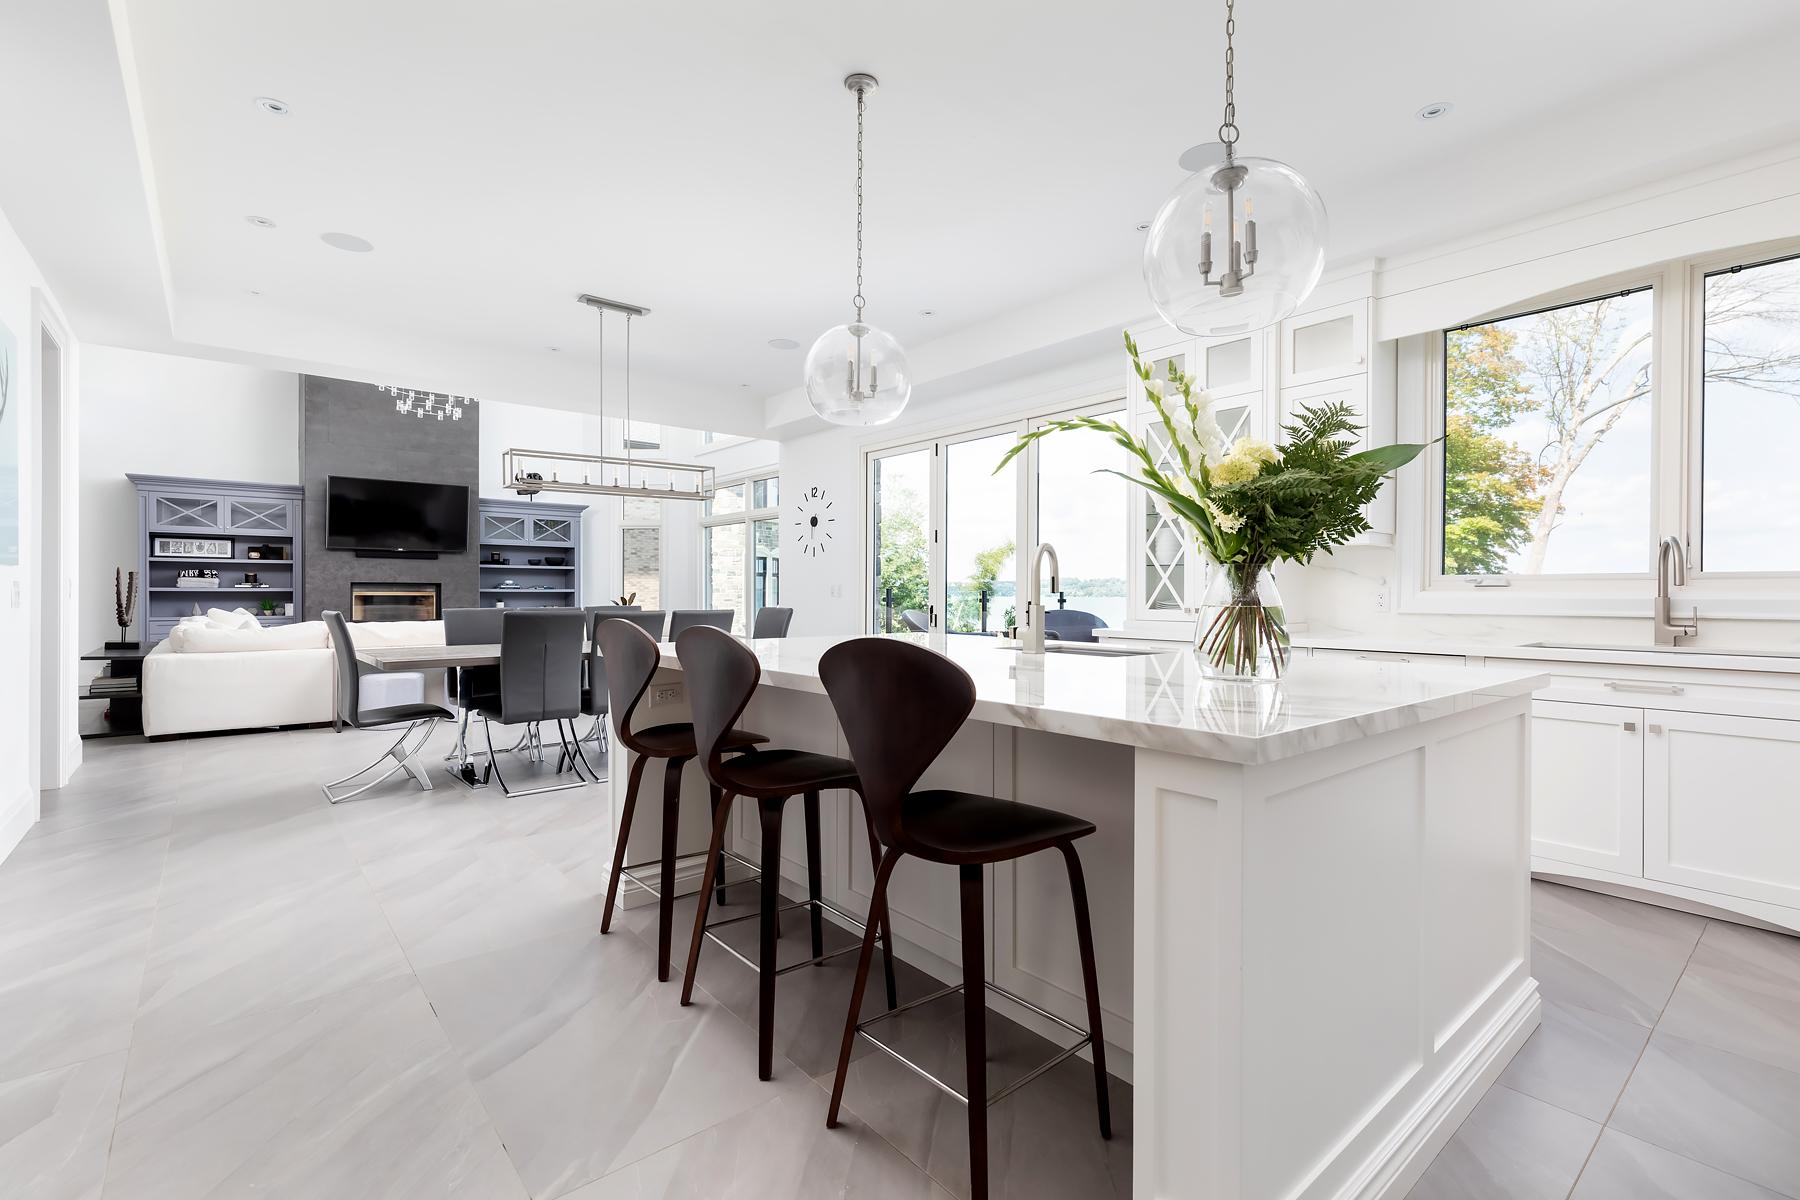 Floor - Paralello Grey | Kitchen - Estatuario E05 | Fireplace - Iron Grey